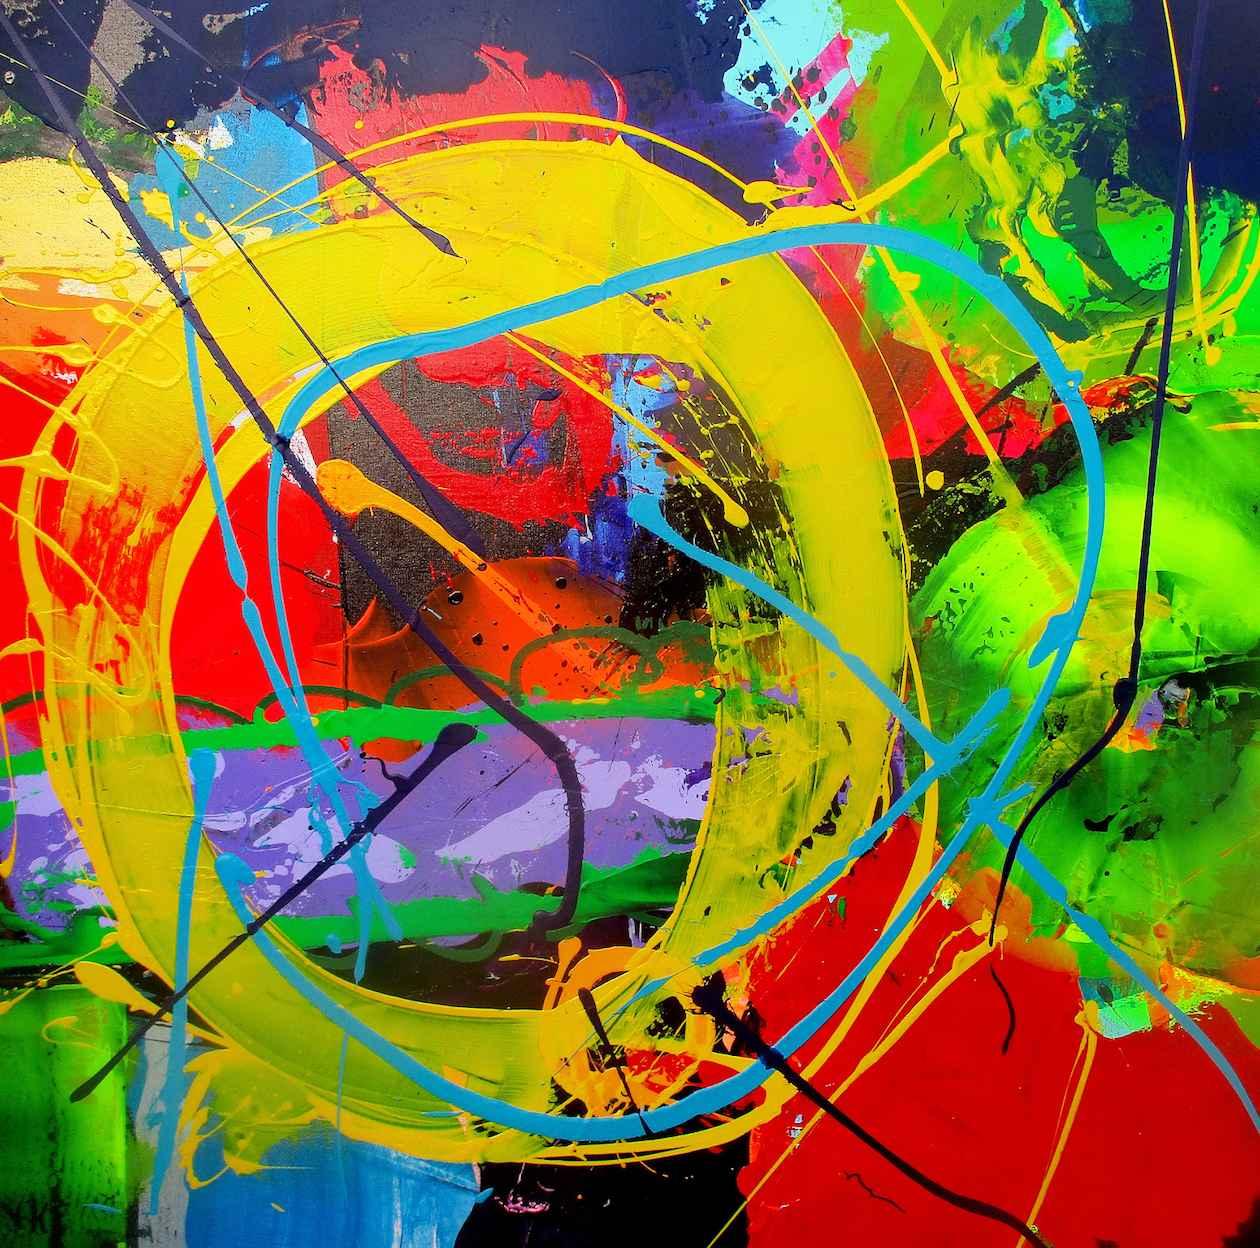 5G by  Vickie Wilson - Masterpiece Online